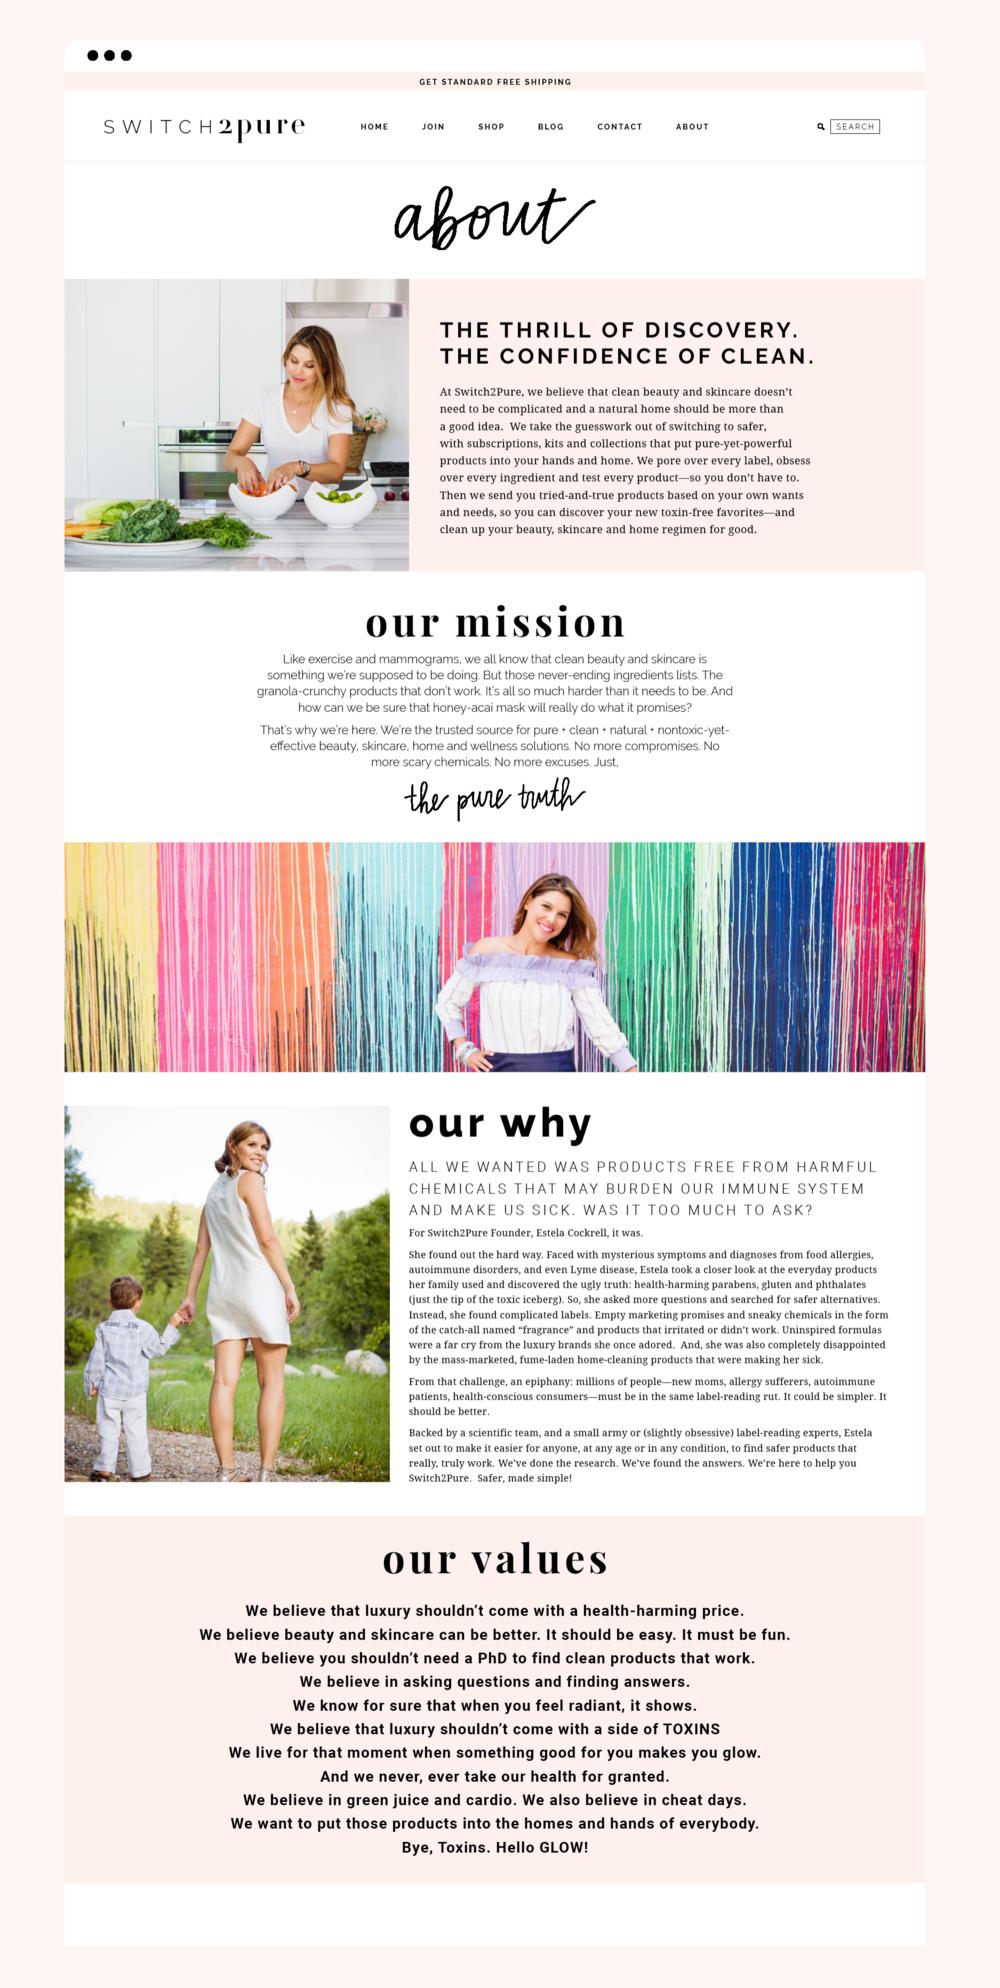 SWitch2pureSite_brightenmade_webdesigner_webdesign_desmoines_beautybranding7.png